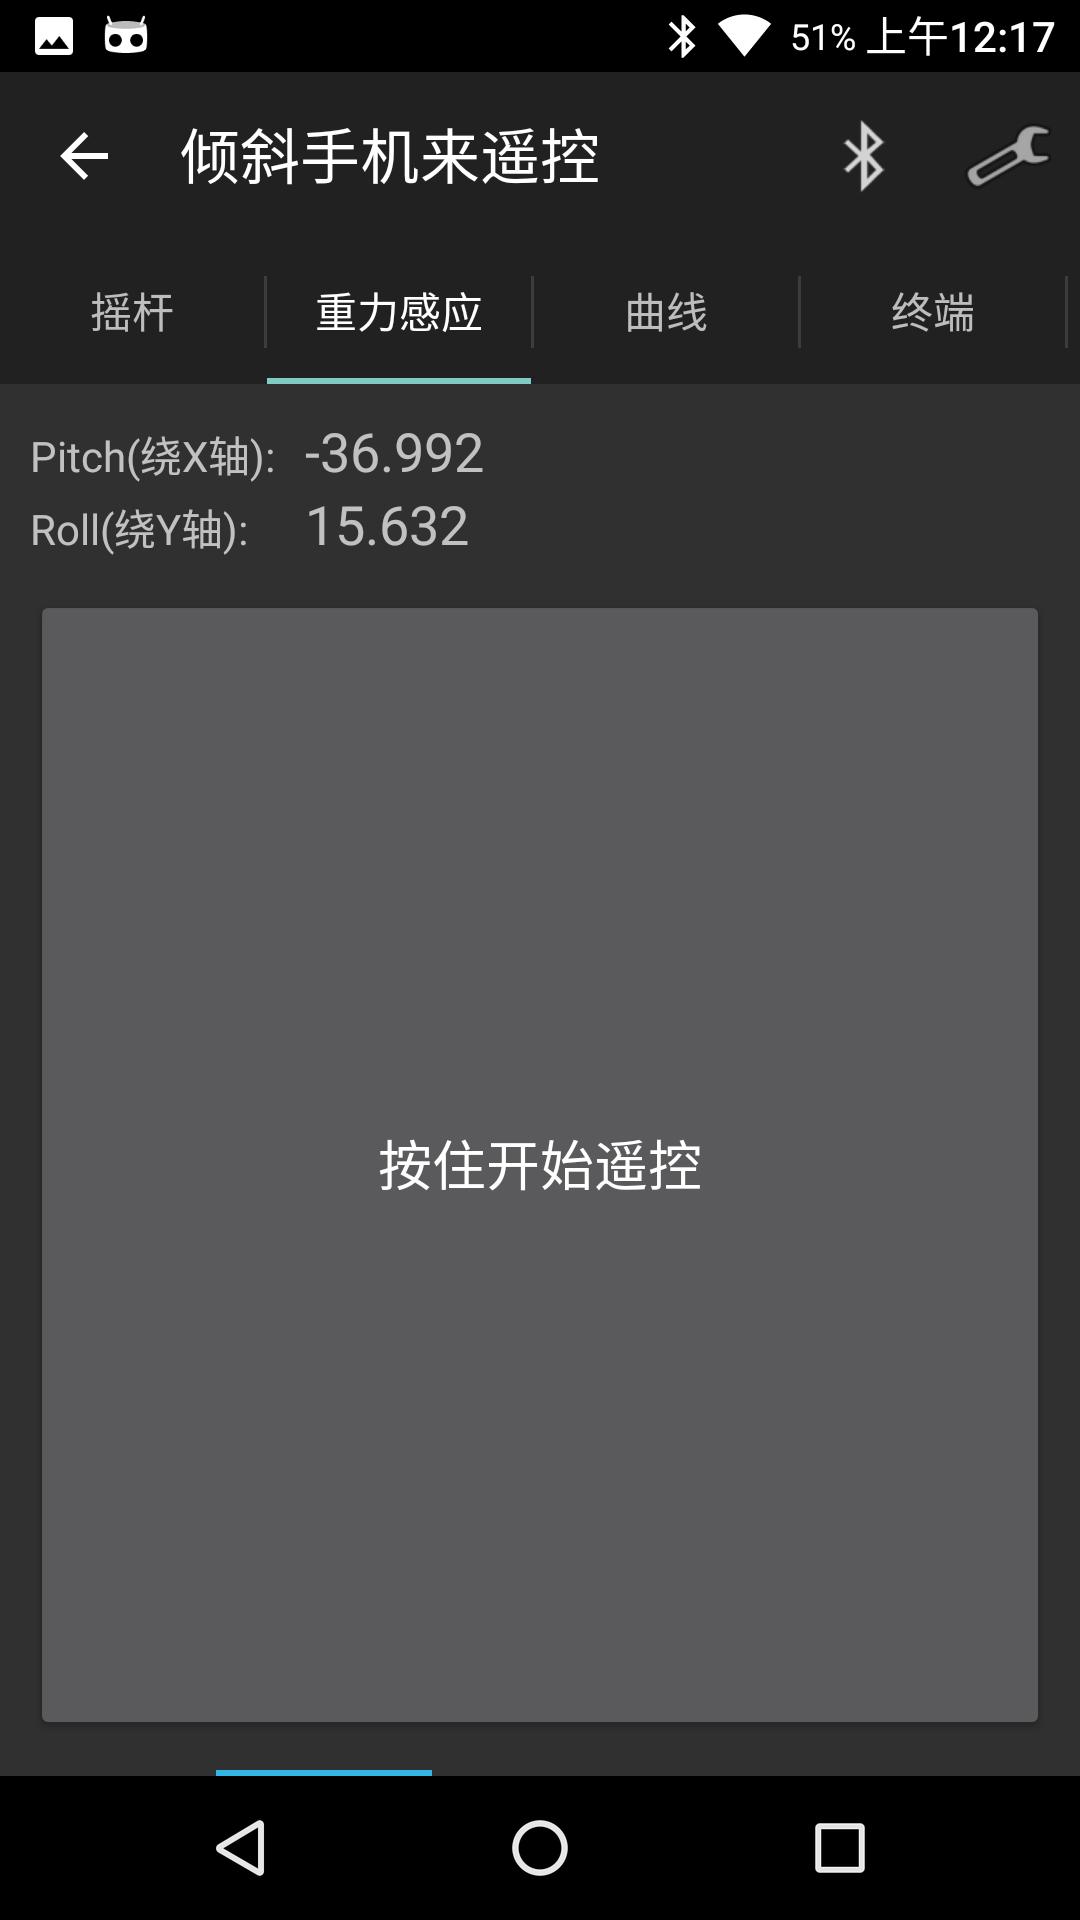 Screenshot_20170323-001750.png